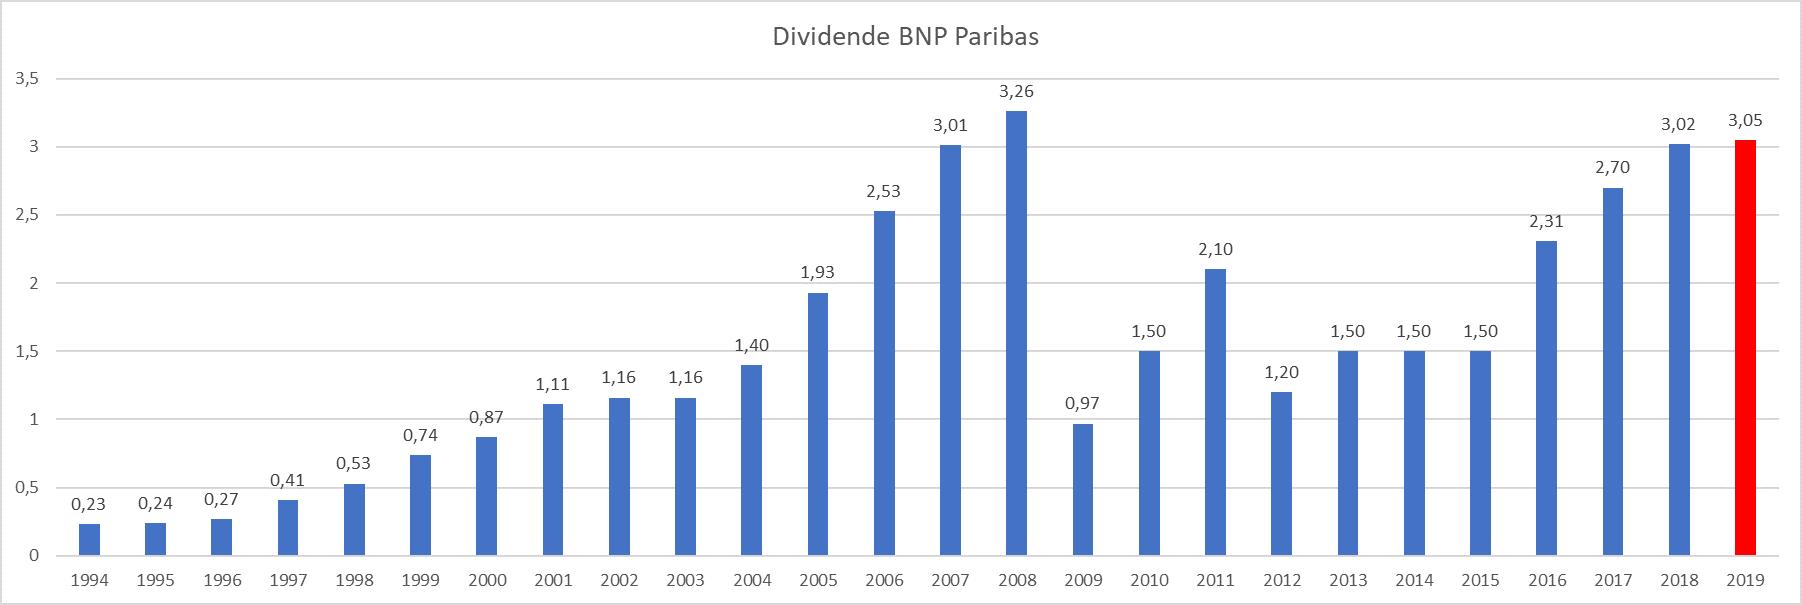 plus gros dividende France BNP Paribas